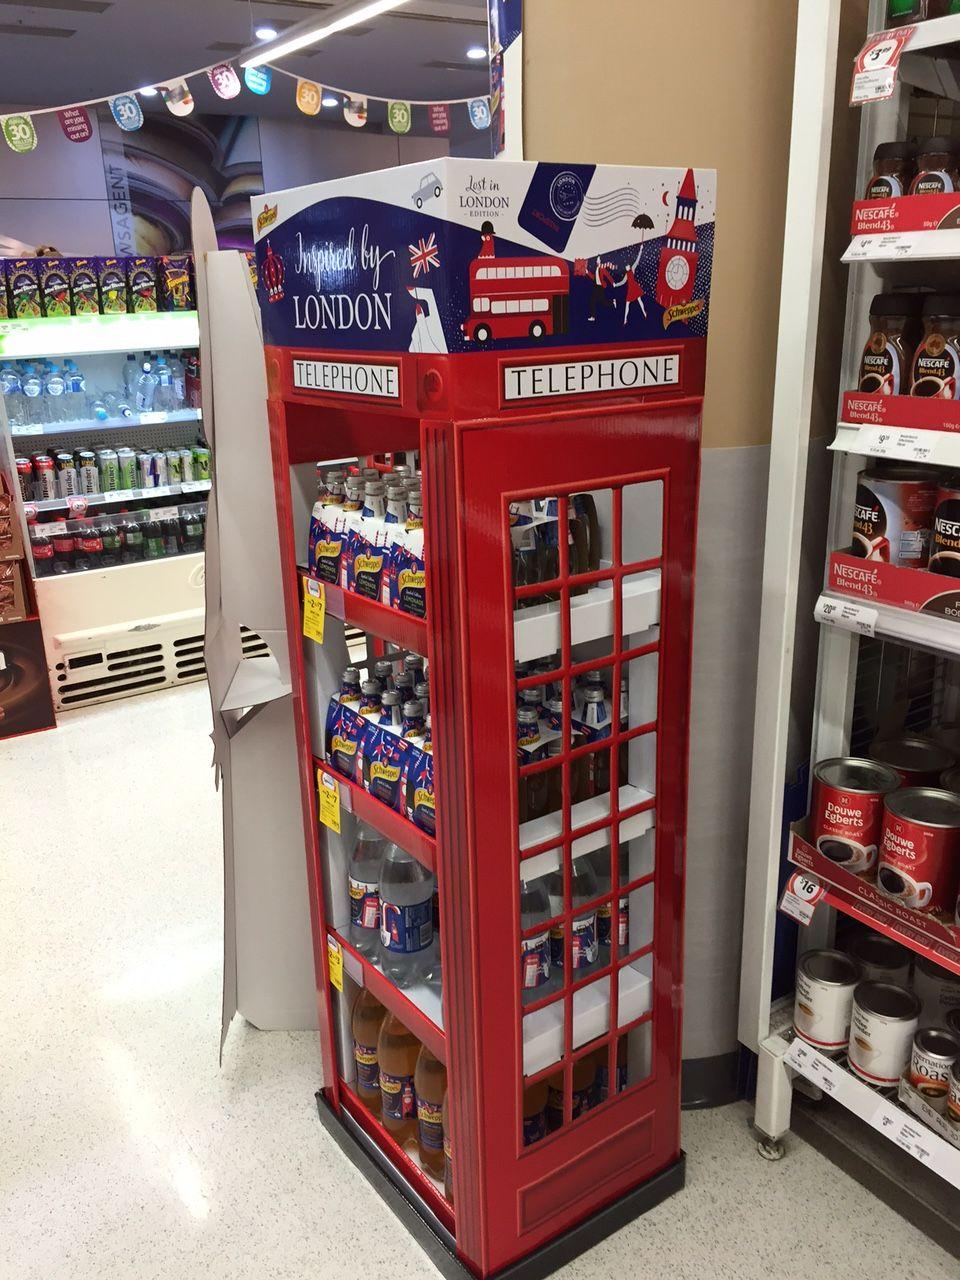 Schweppes Coles Grocery Beverages Softdrink Onpack Inspiredbylondon Offlocation Crosscategory Oct2015